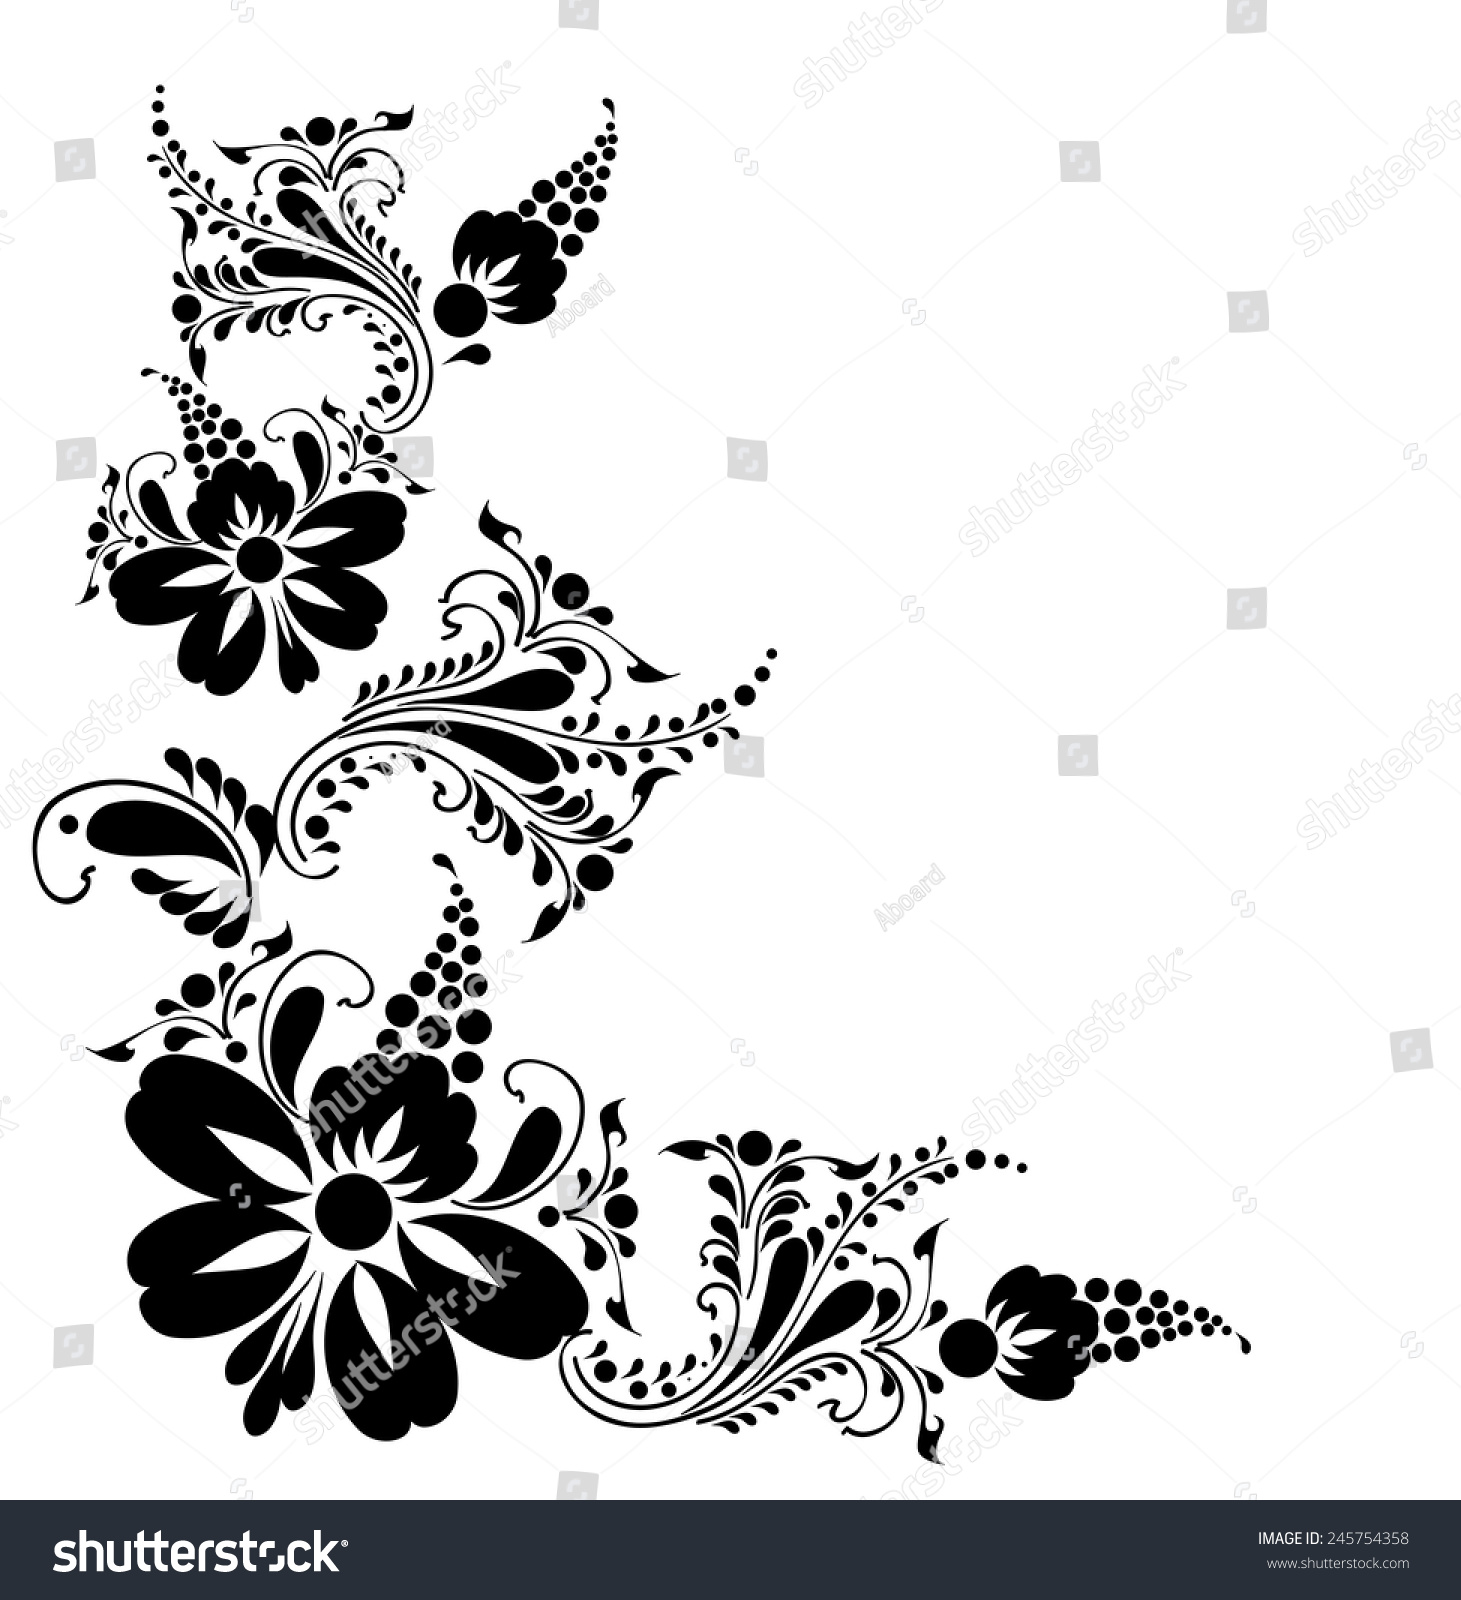 Flowers Design Samannetonic